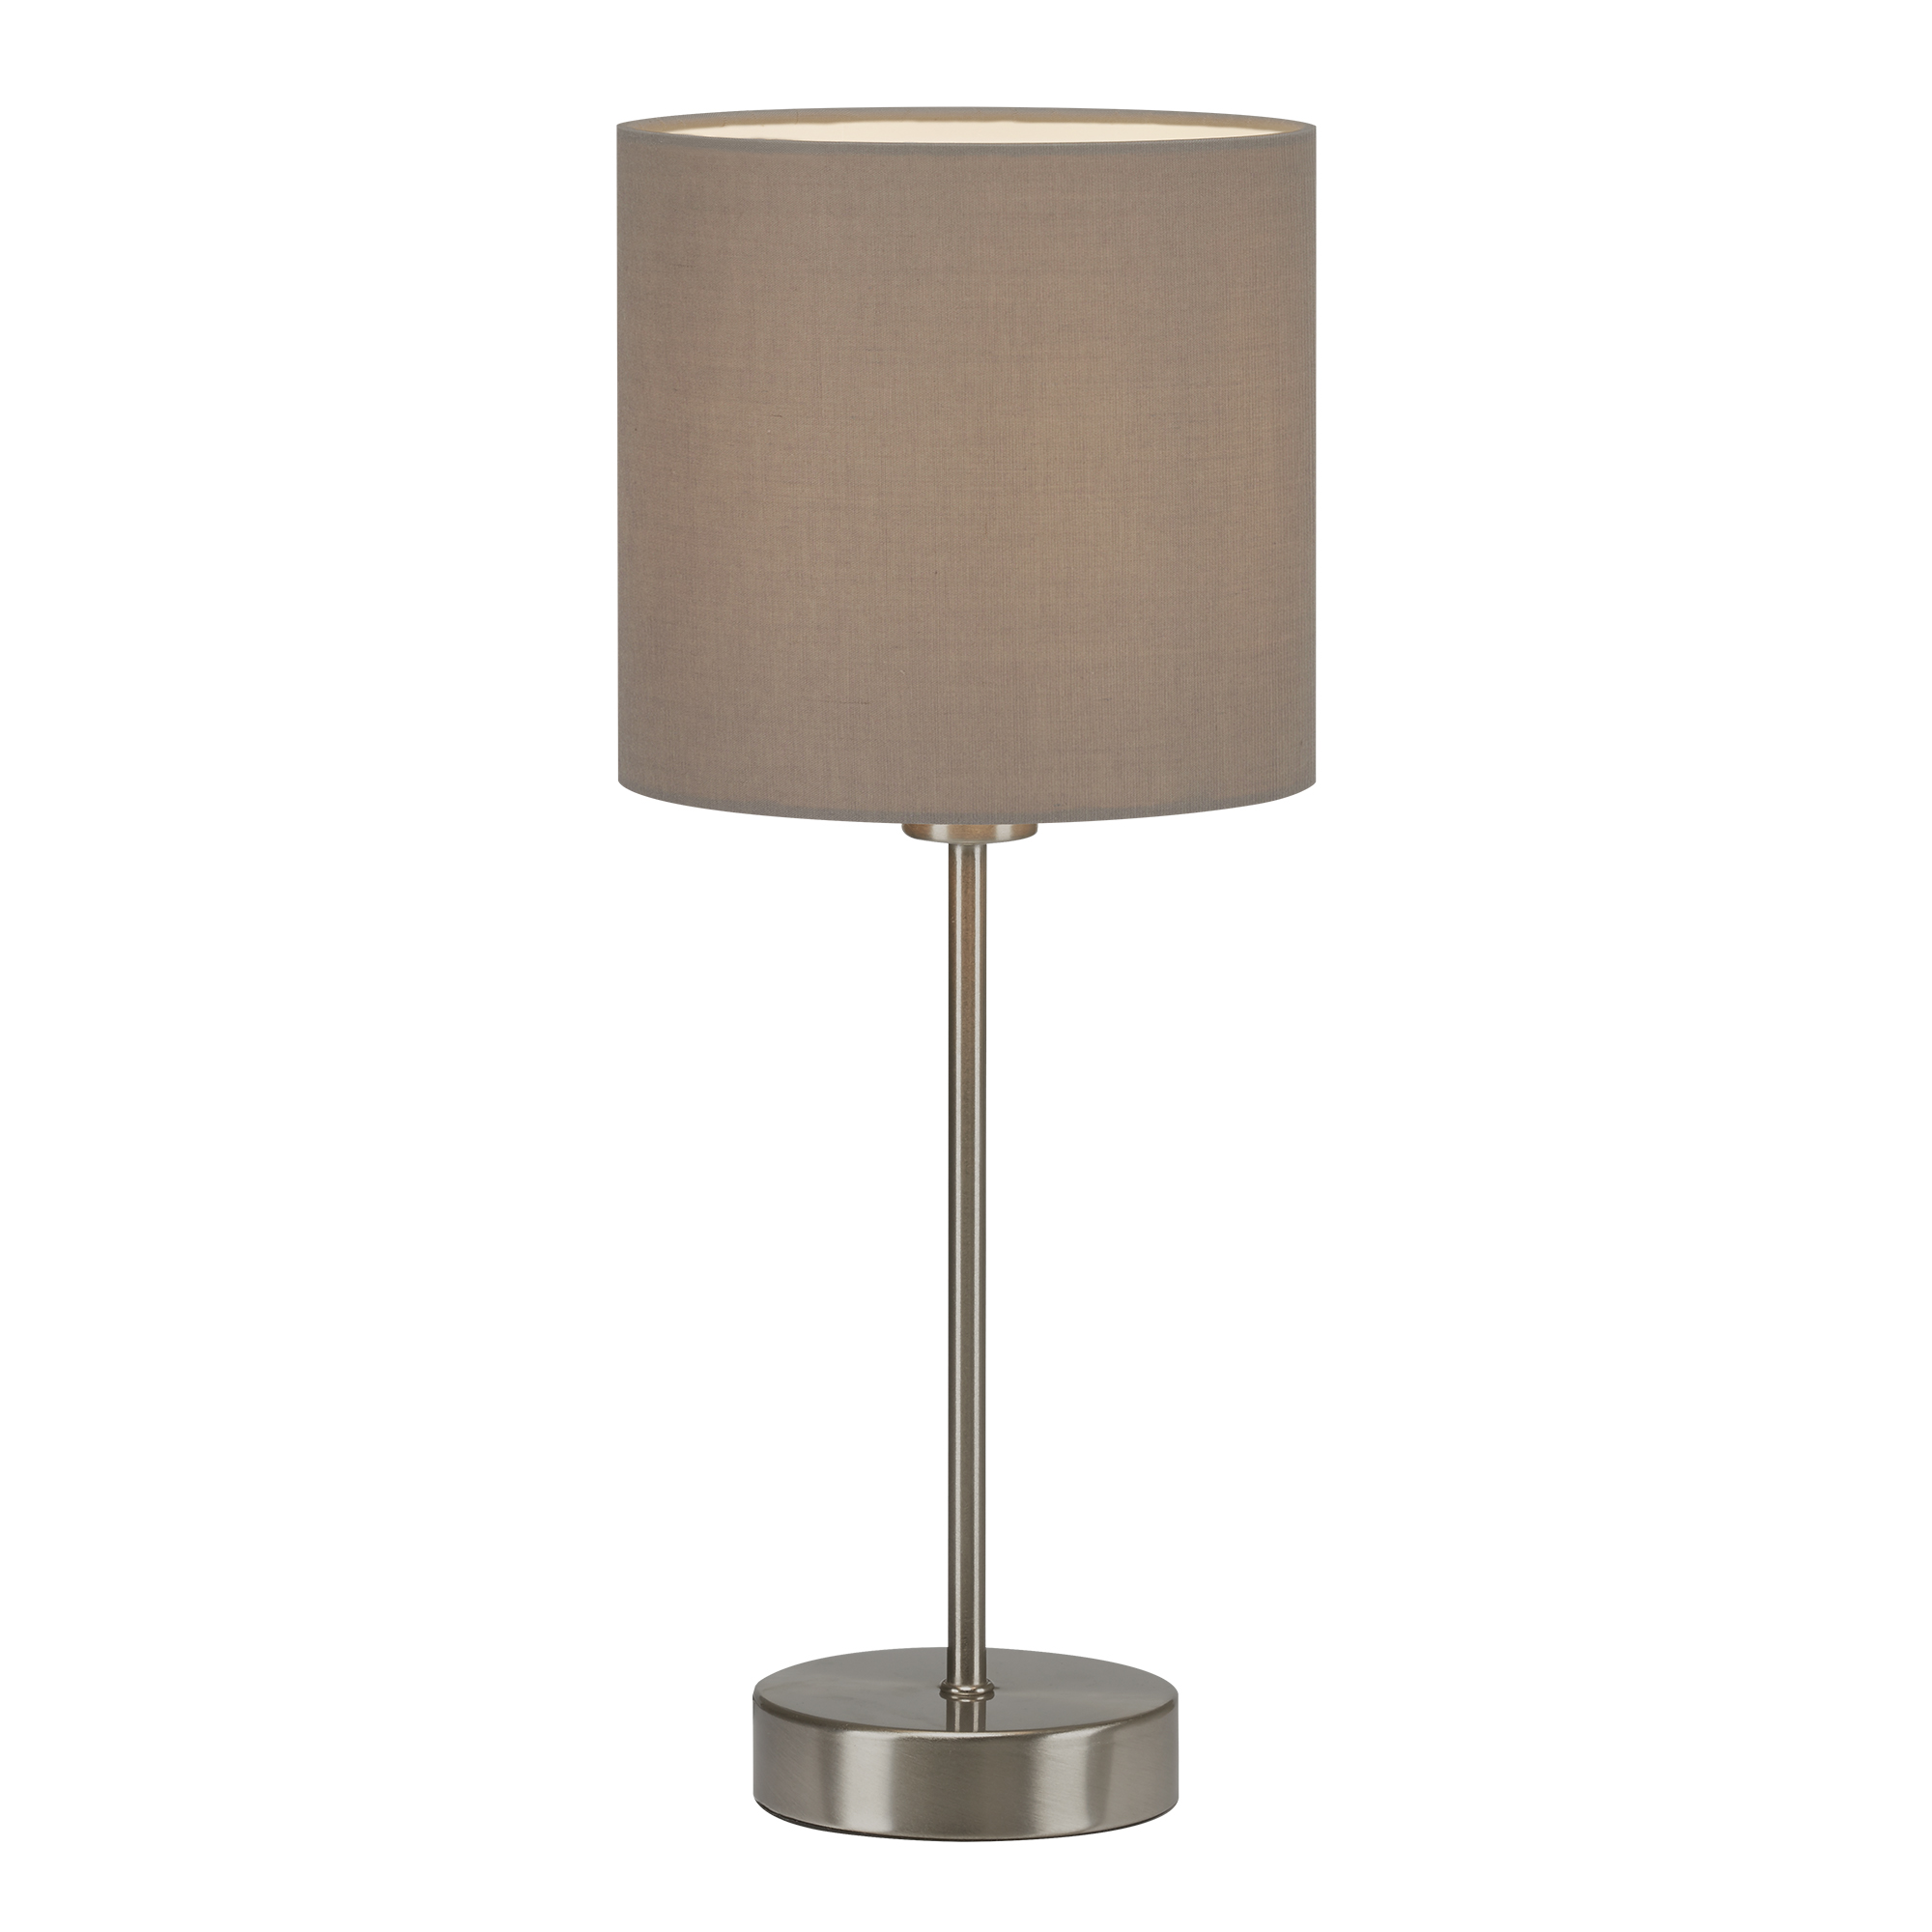 LED Tischleuchte, max. 25 W, 38,5 cm, Taupe